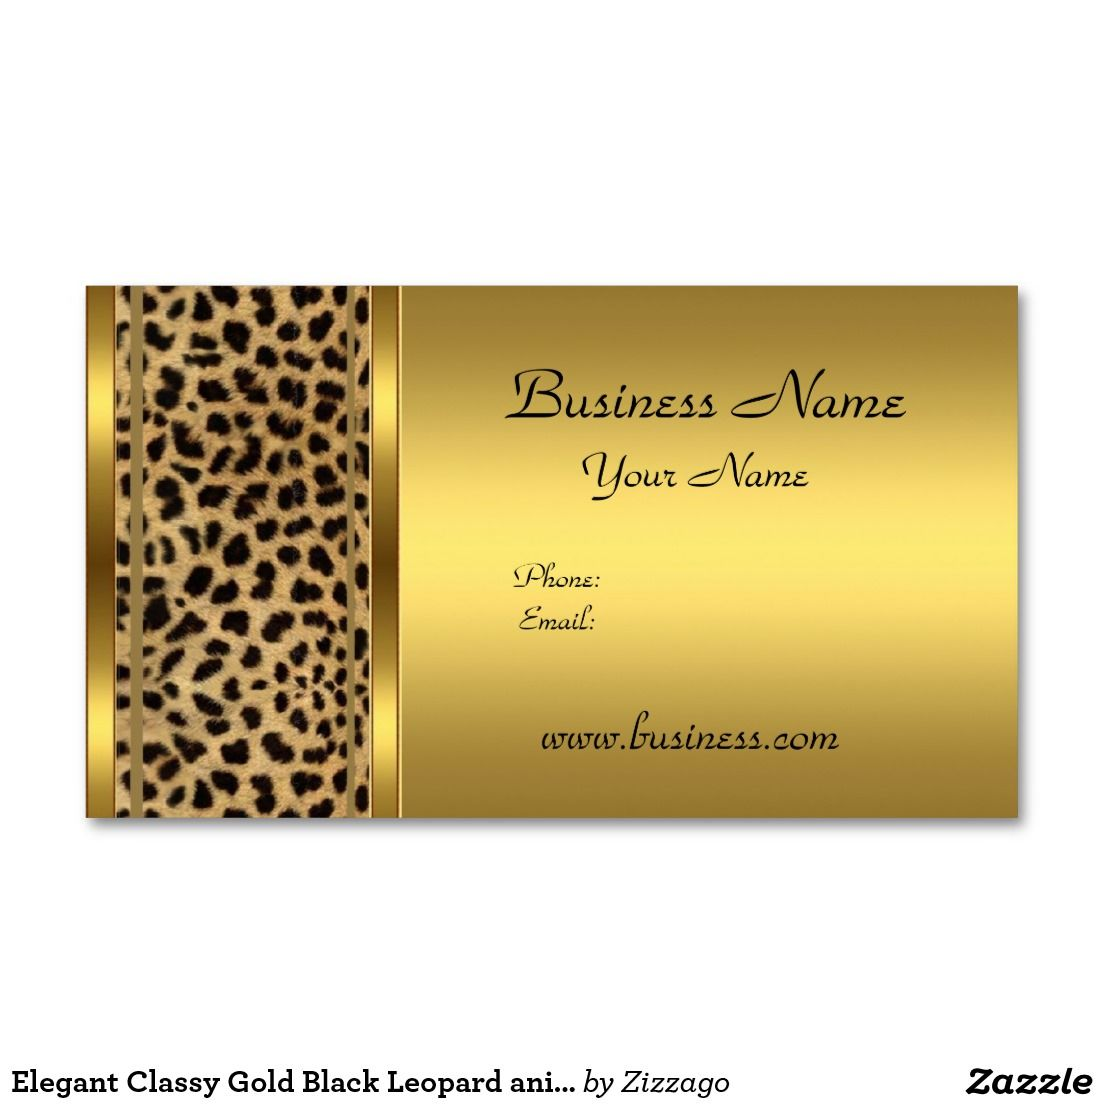 Elegant Classy Gold Black Leopard animal print Business Card ...